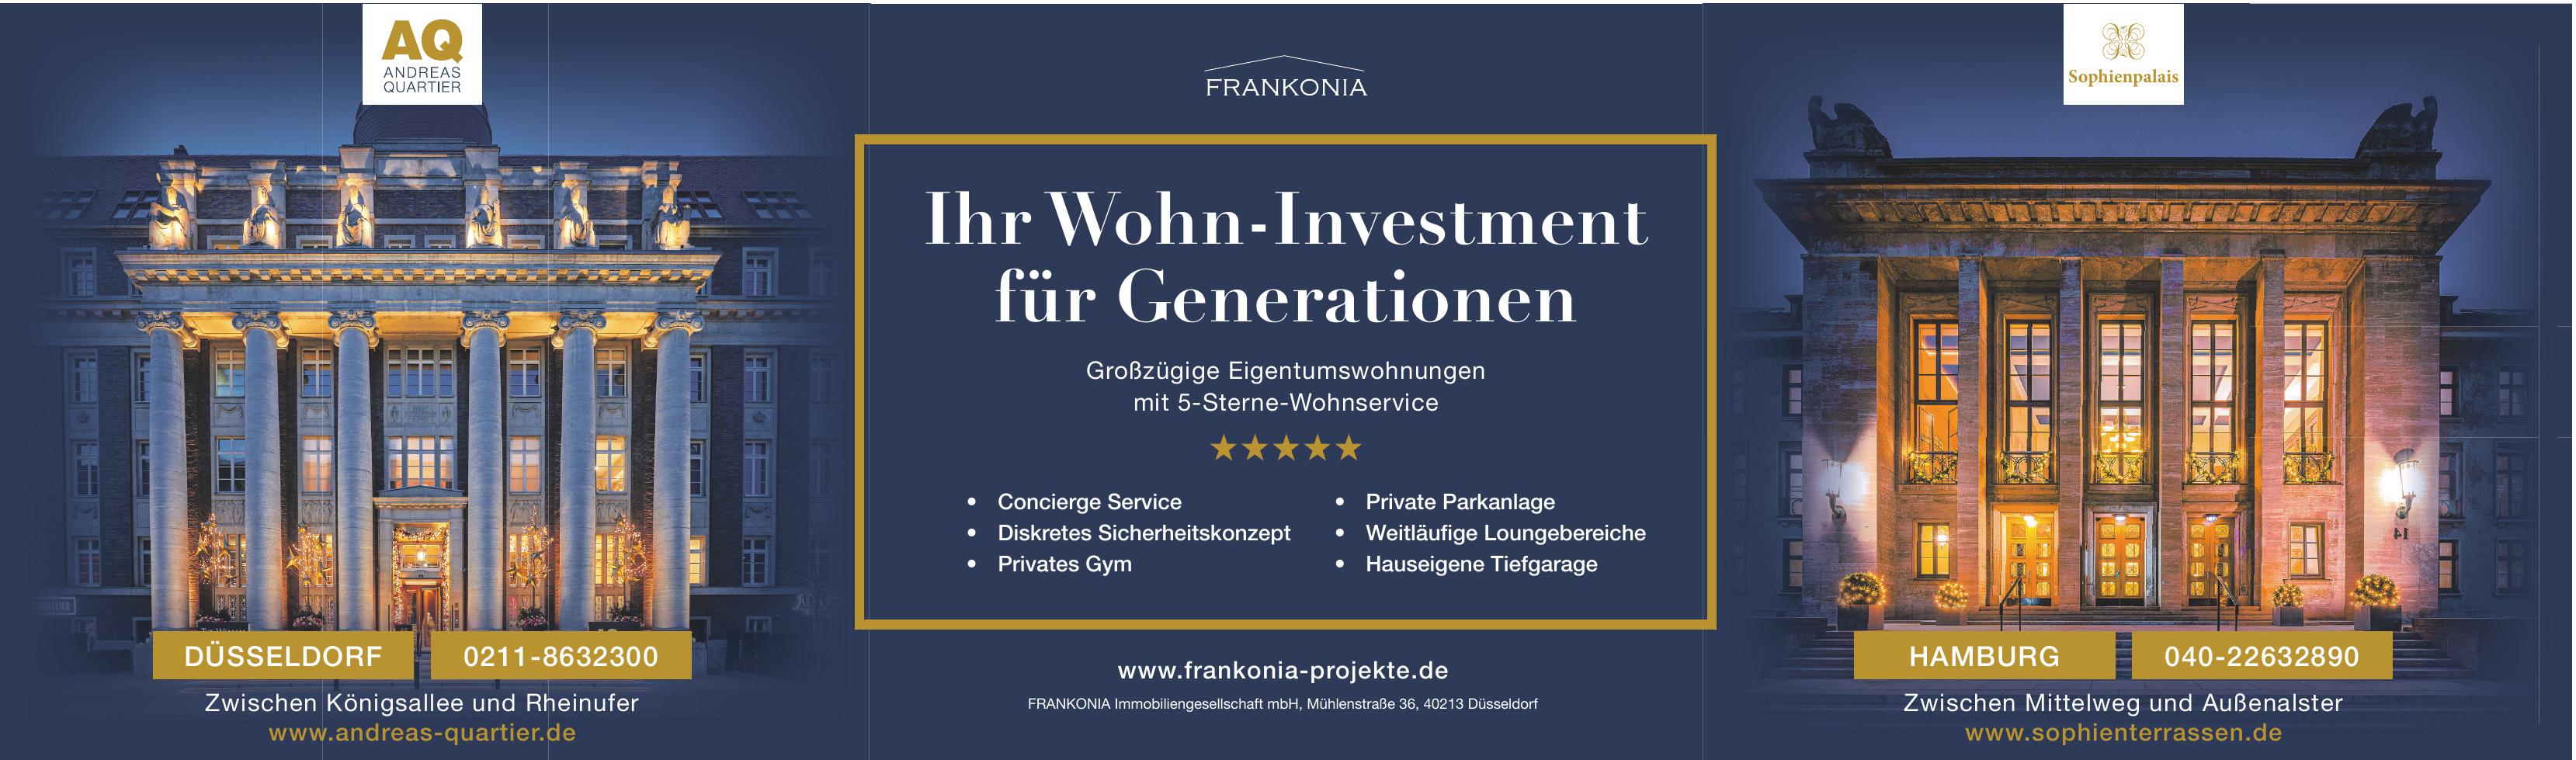 FRANKONIA Immobiliengesellschaft mbH